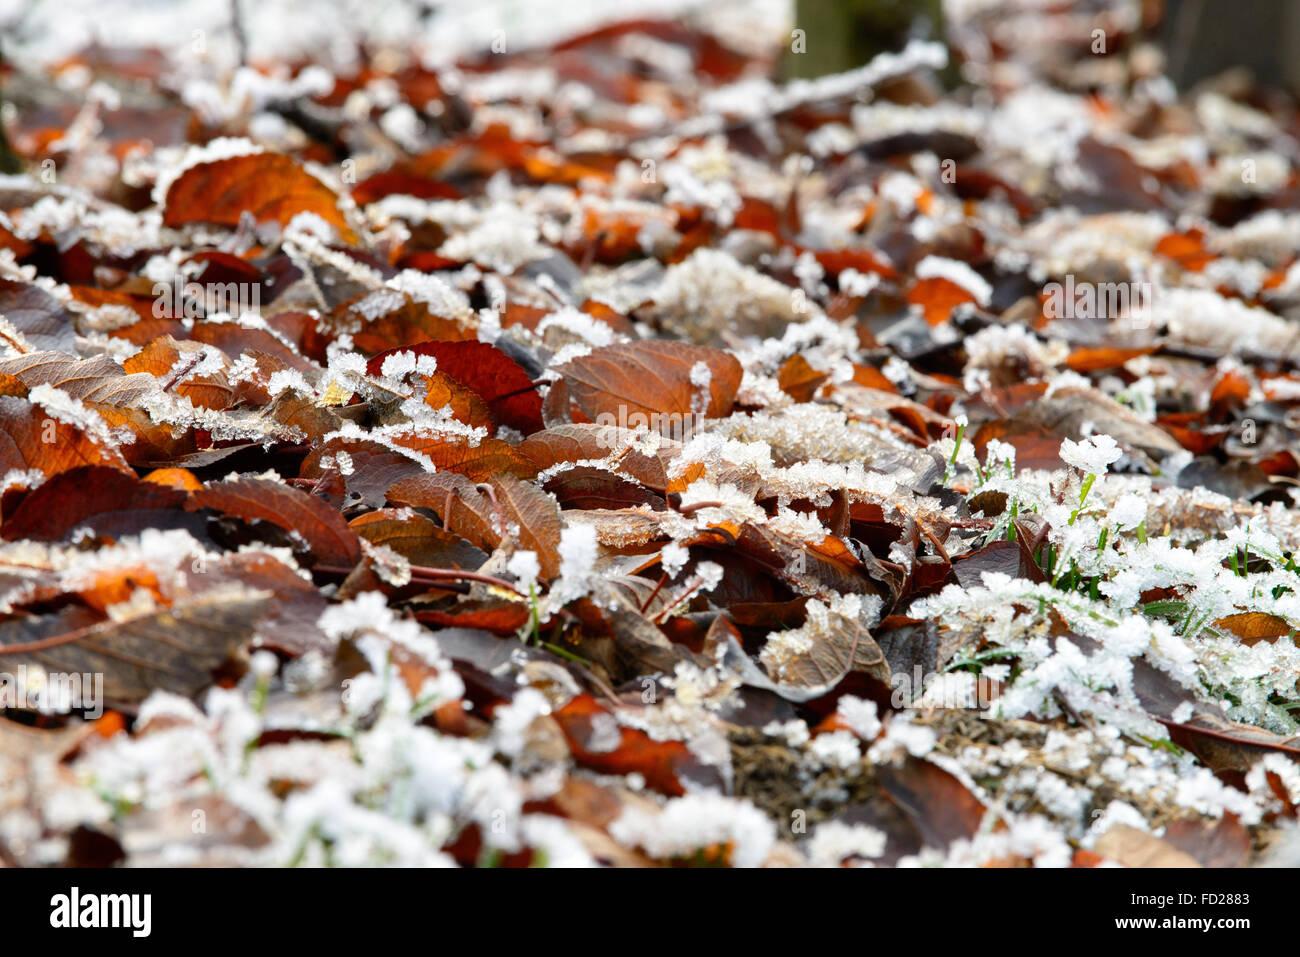 Herbstlaub, Rauhreif | autumn foliage, hoar frost Stock Photo